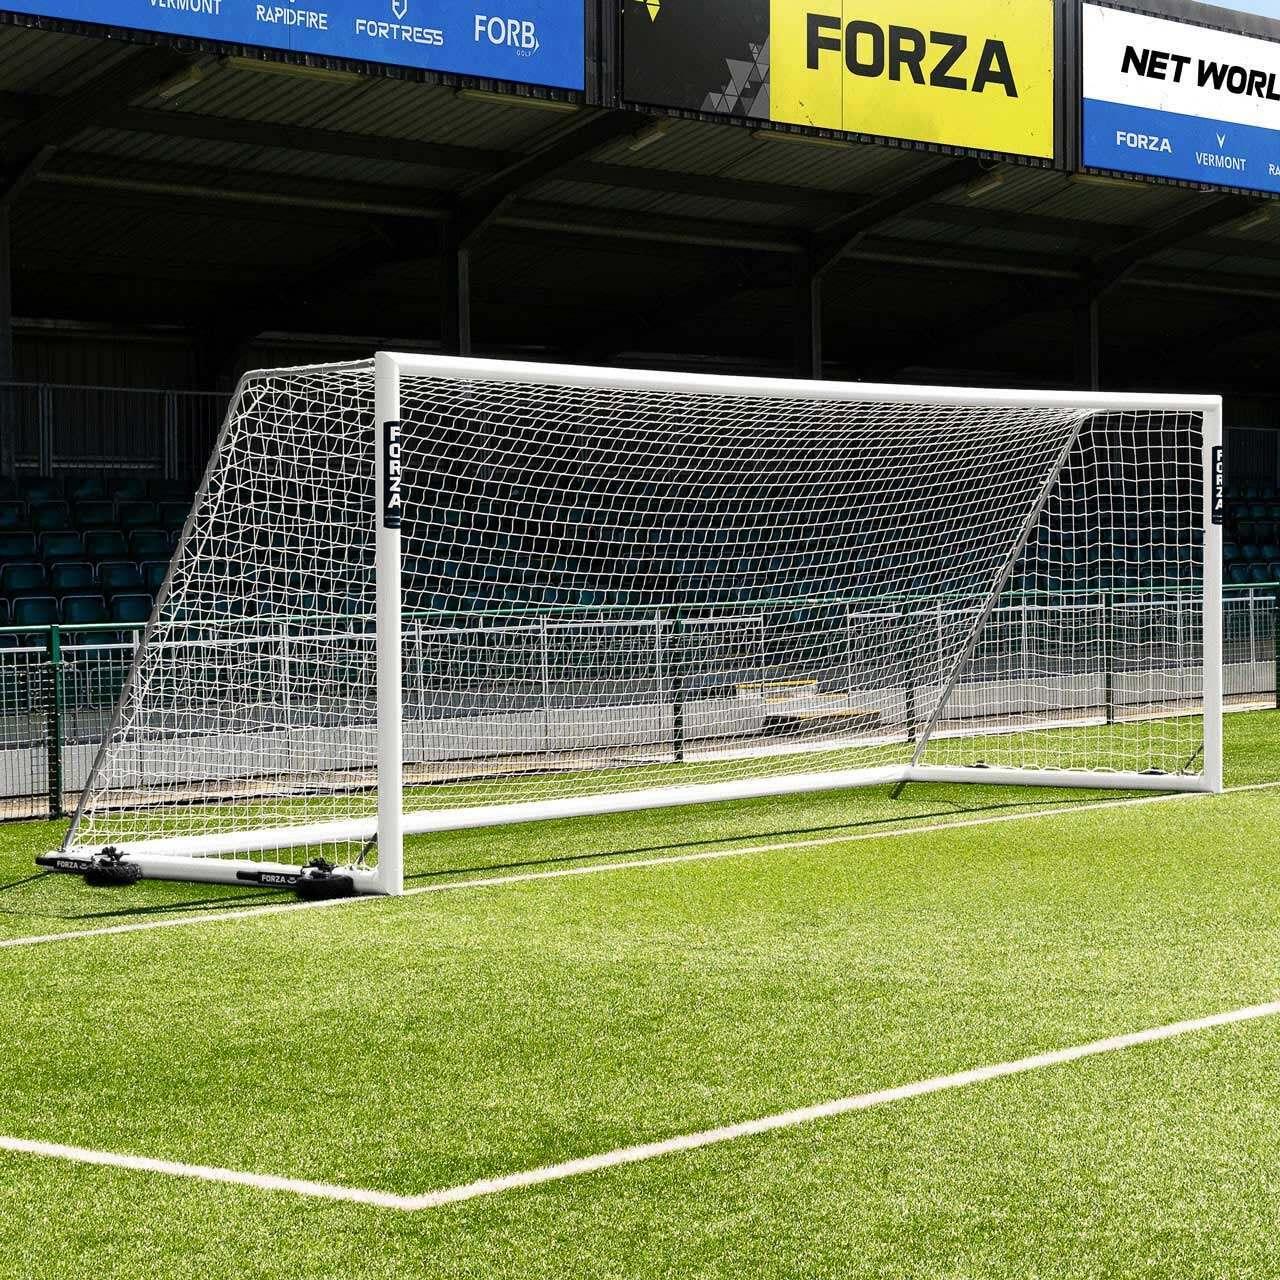 Football Net 24 x 8FT Soccer Goal Post Nets Full Size Sports Training Match USA